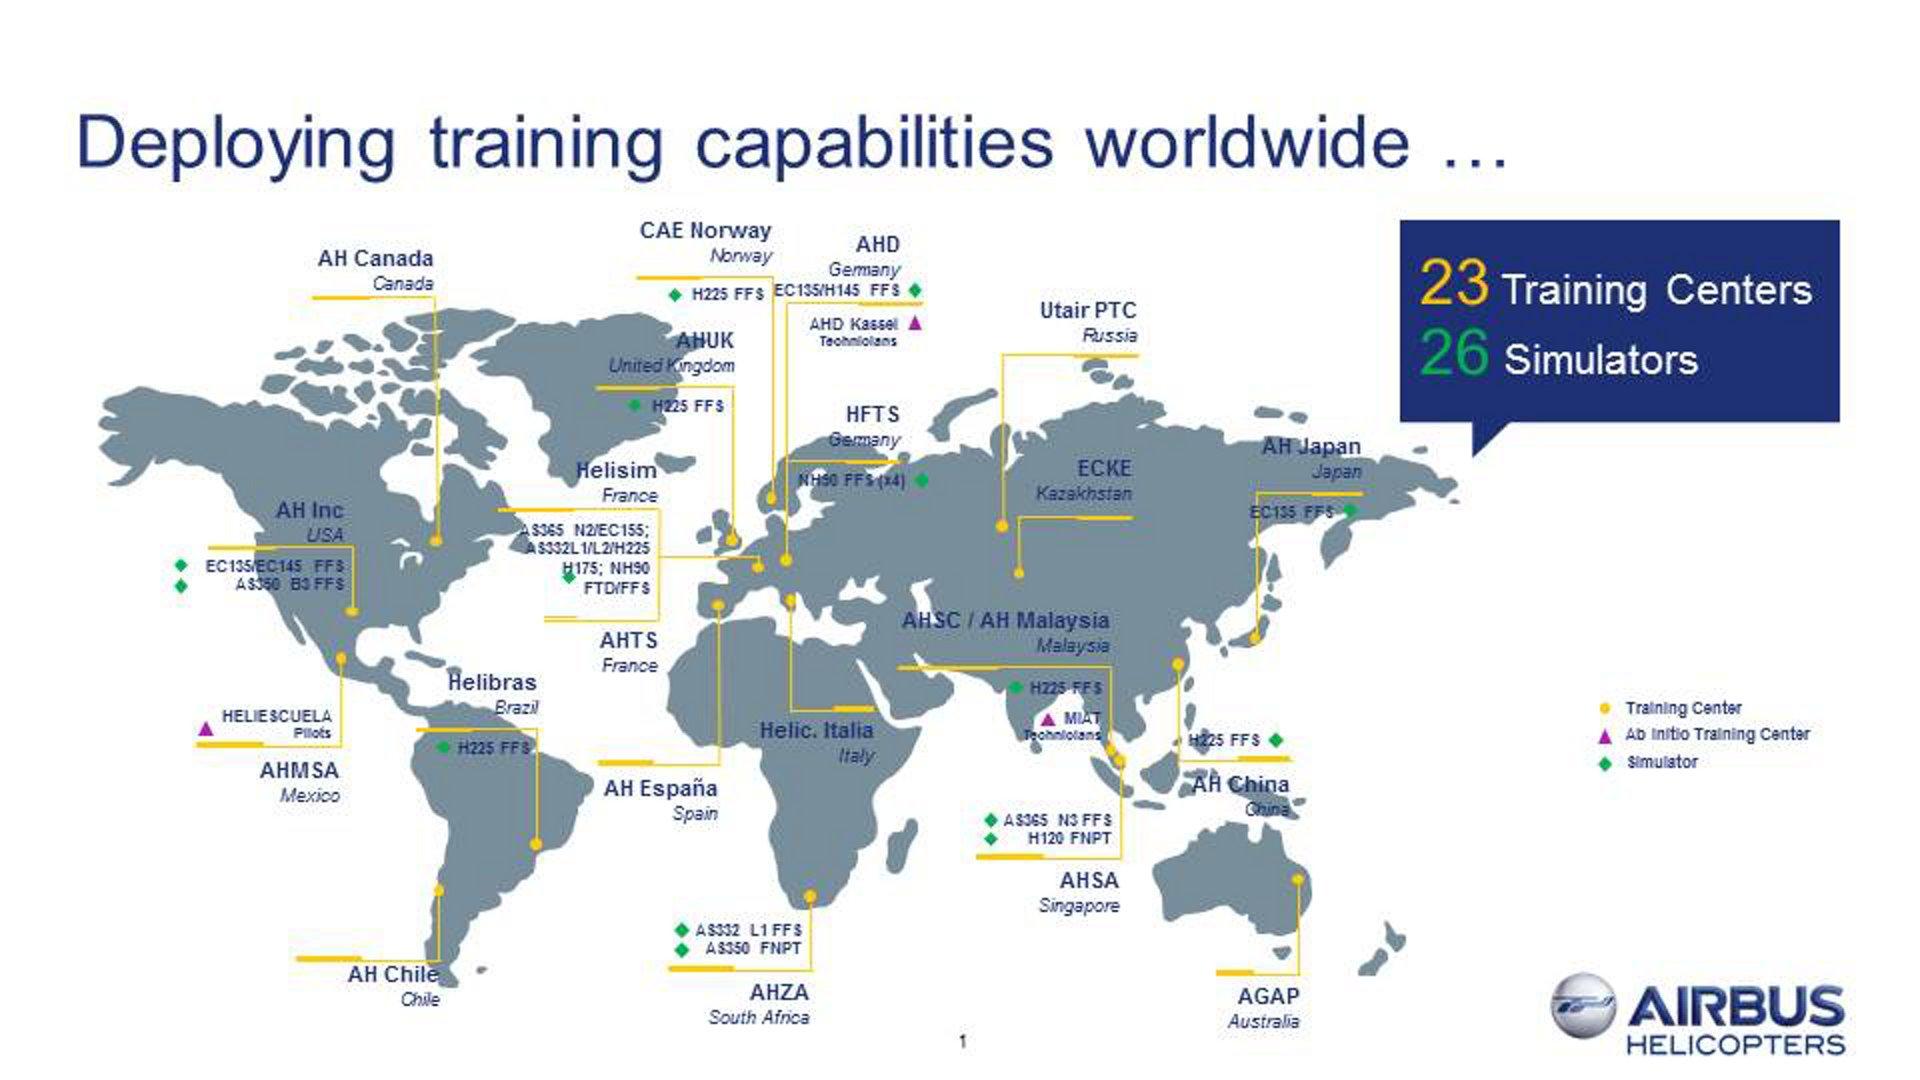 Deploying training capabilities worldwide